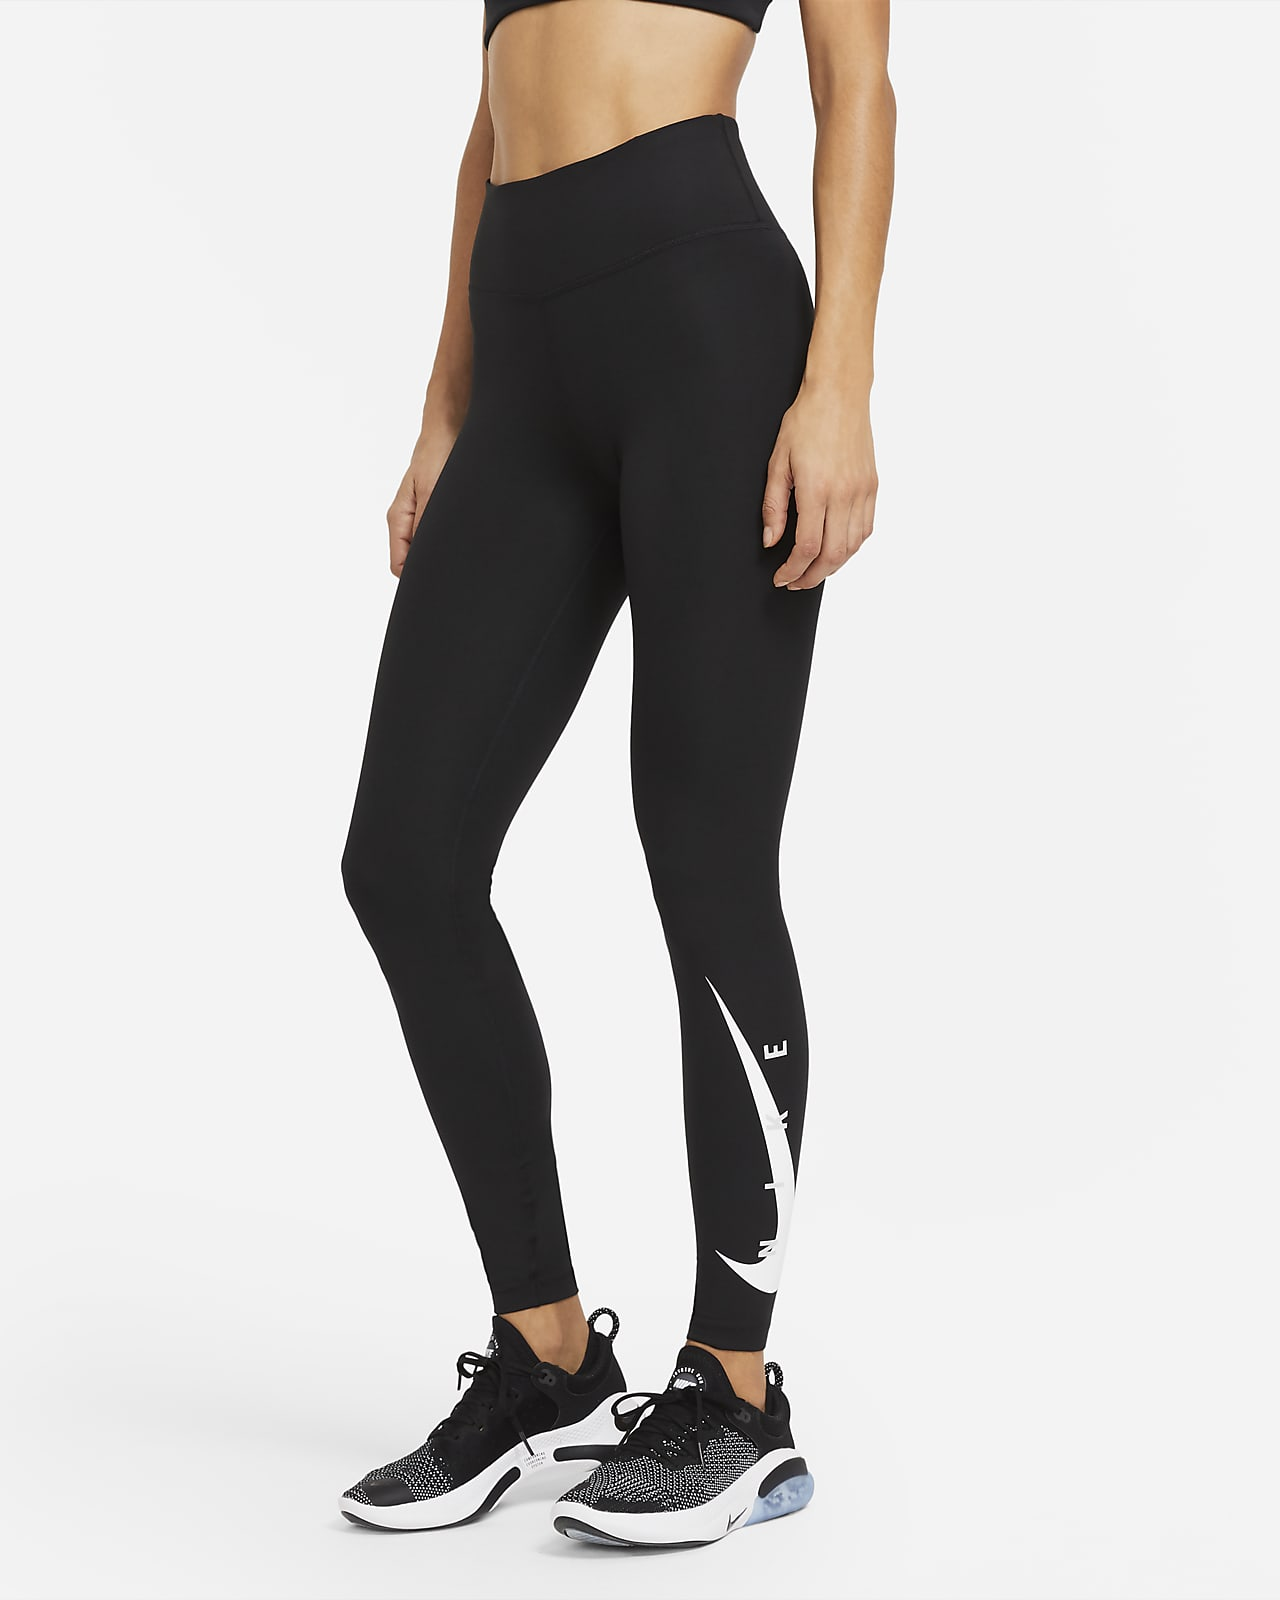 Nike Swoosh Run középmagas derekú, 7/8-os női futóleggings